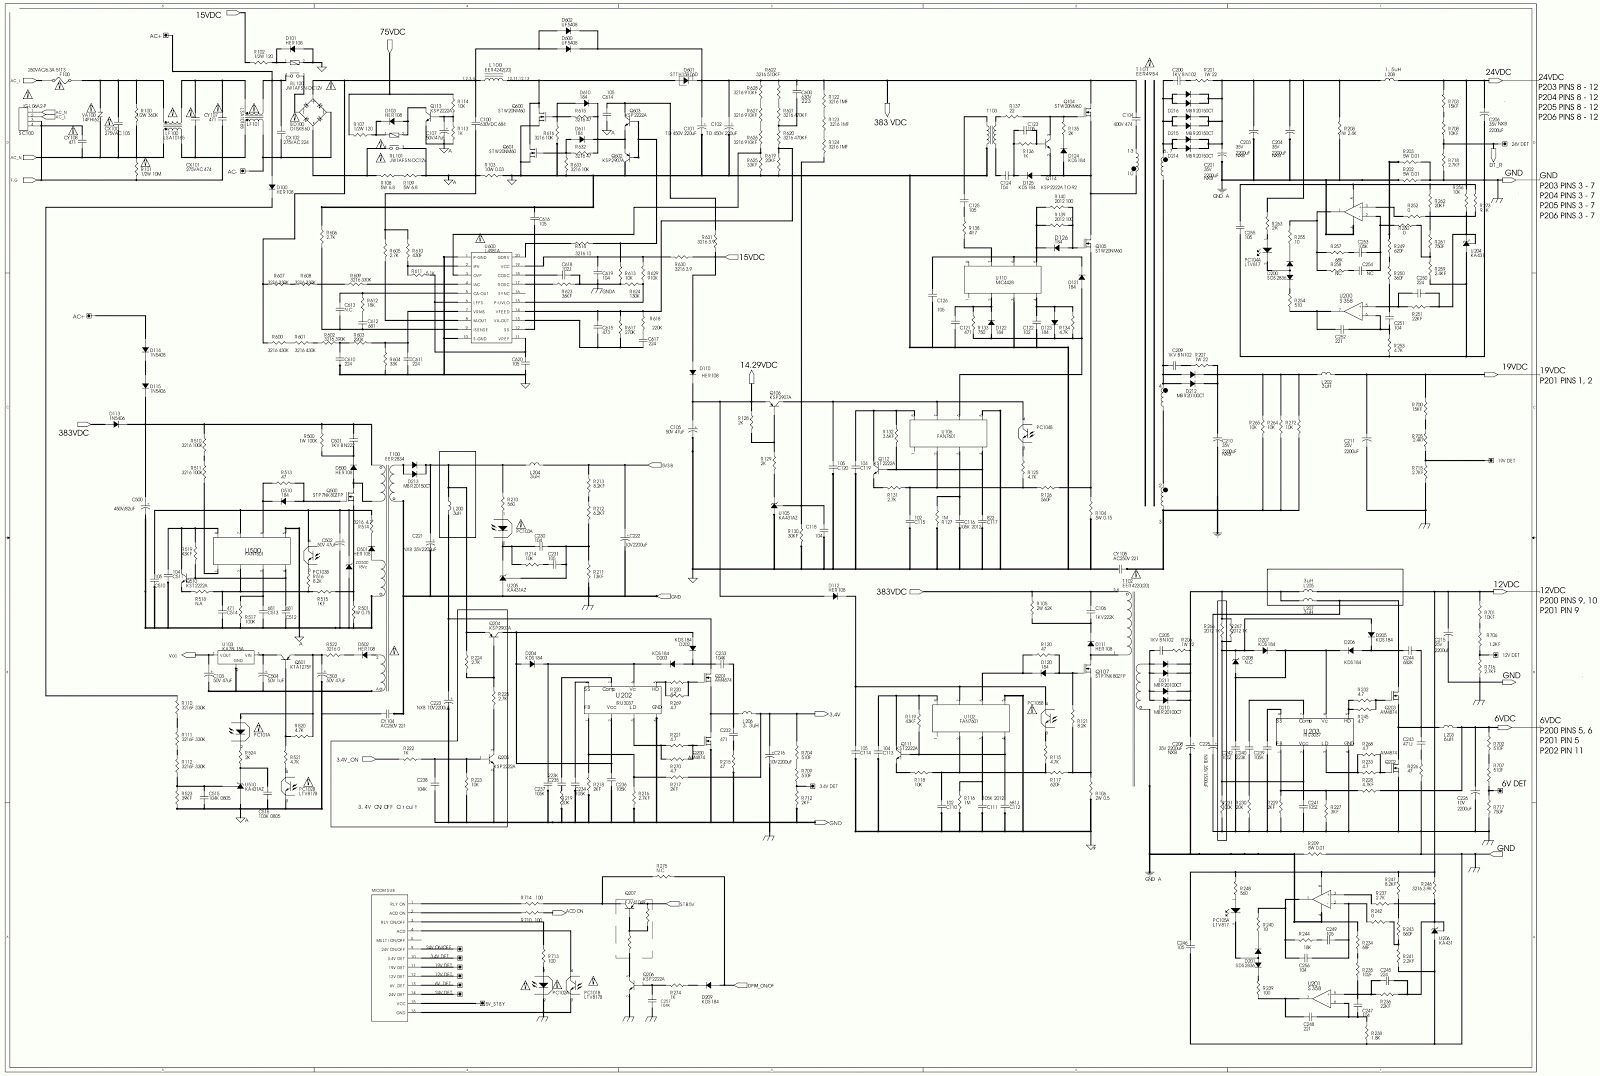 small resolution of vizio tv wiring diagram wiring diagram ebookvizio tv wiring diagram wiring diagrams lolvizio tv wiring diagram